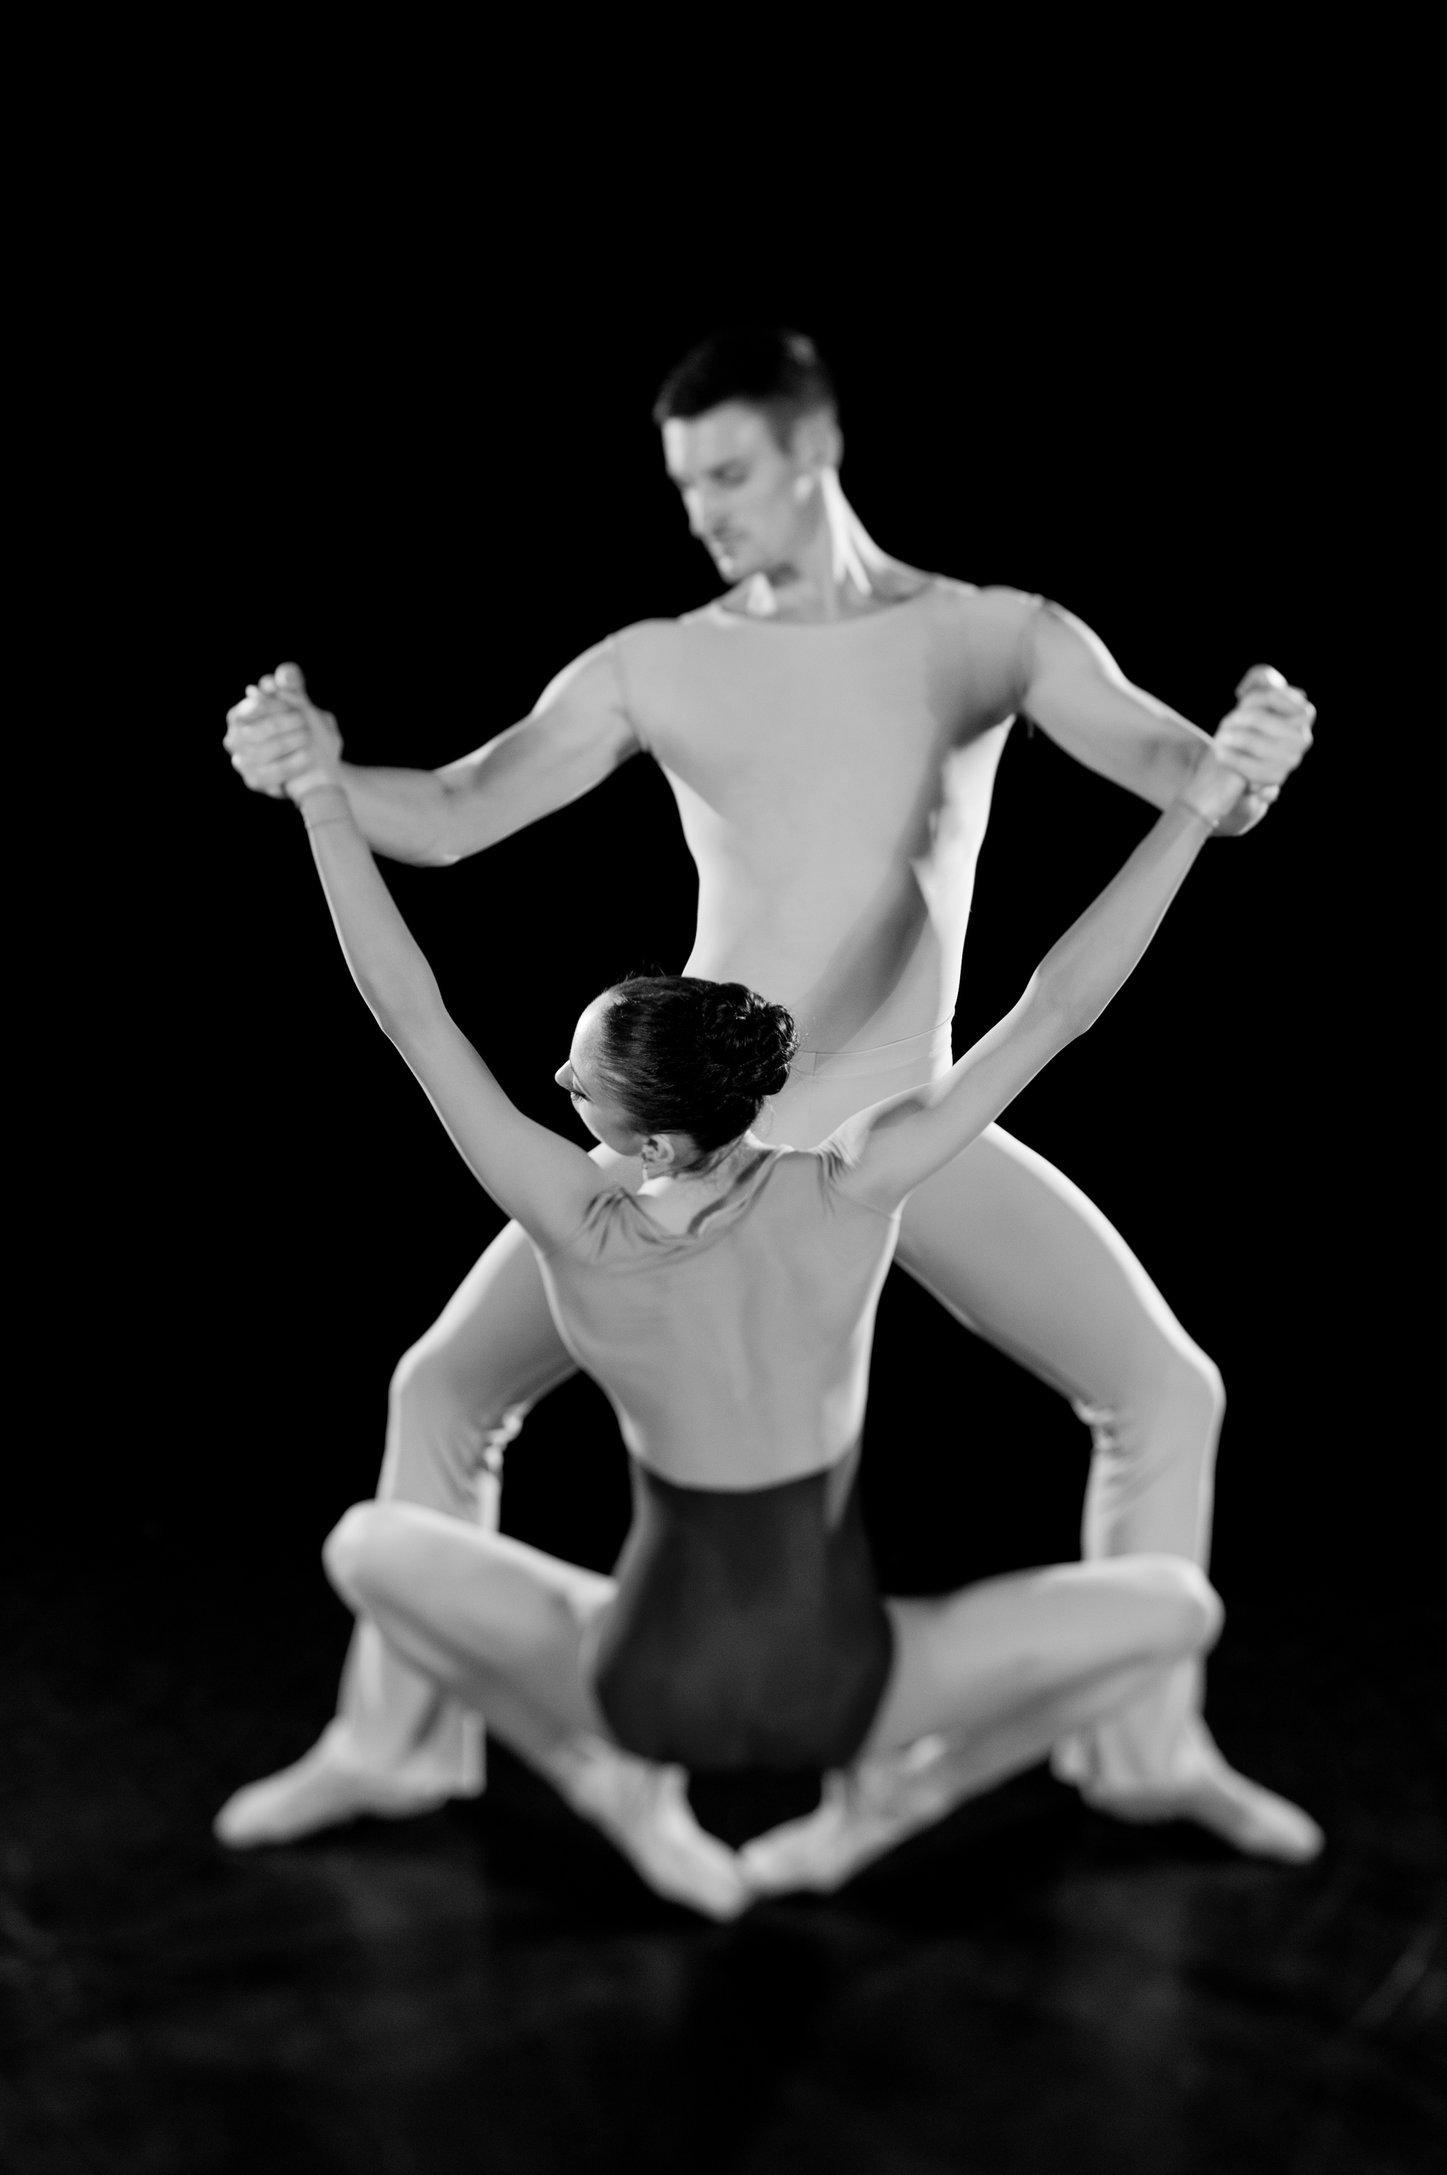 MANNY_DANCE_25.JPG